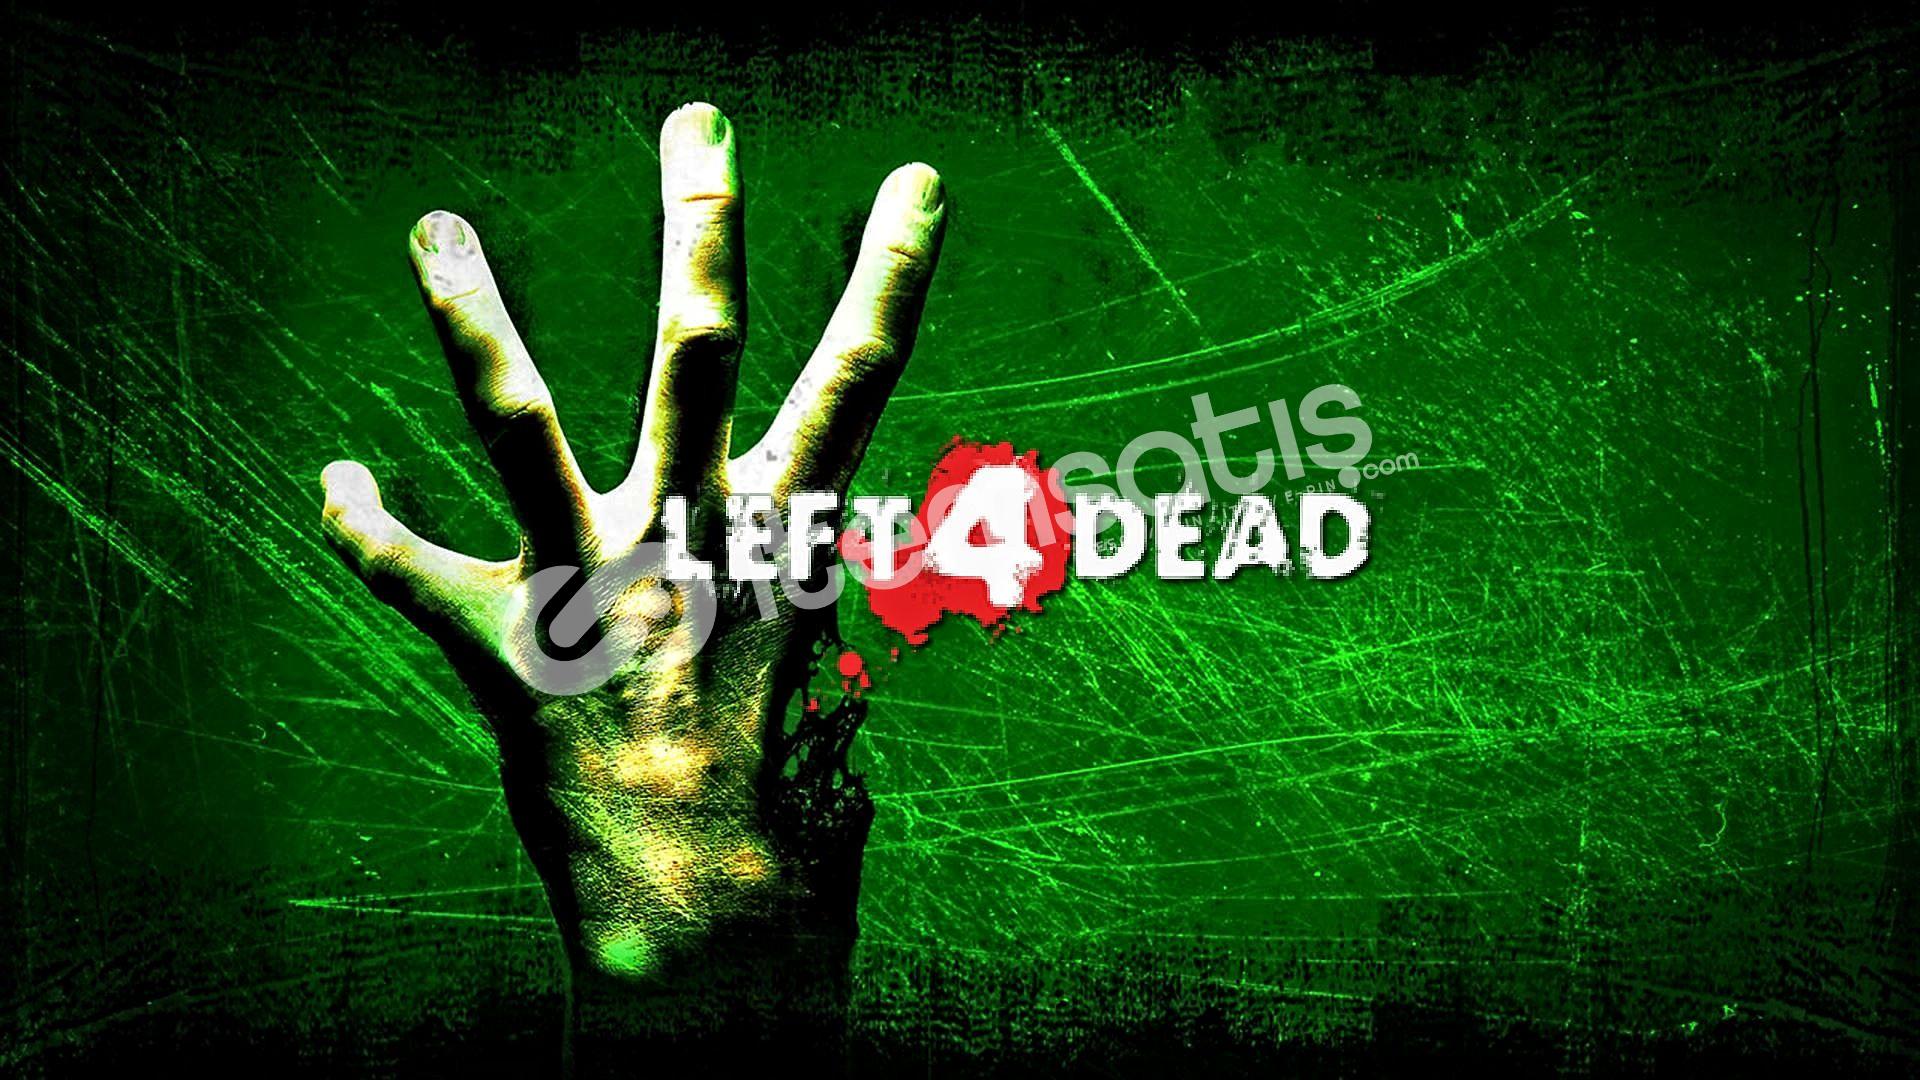 Left 4 Dead 1 + Left 4 Dead 2 (4.99TL)